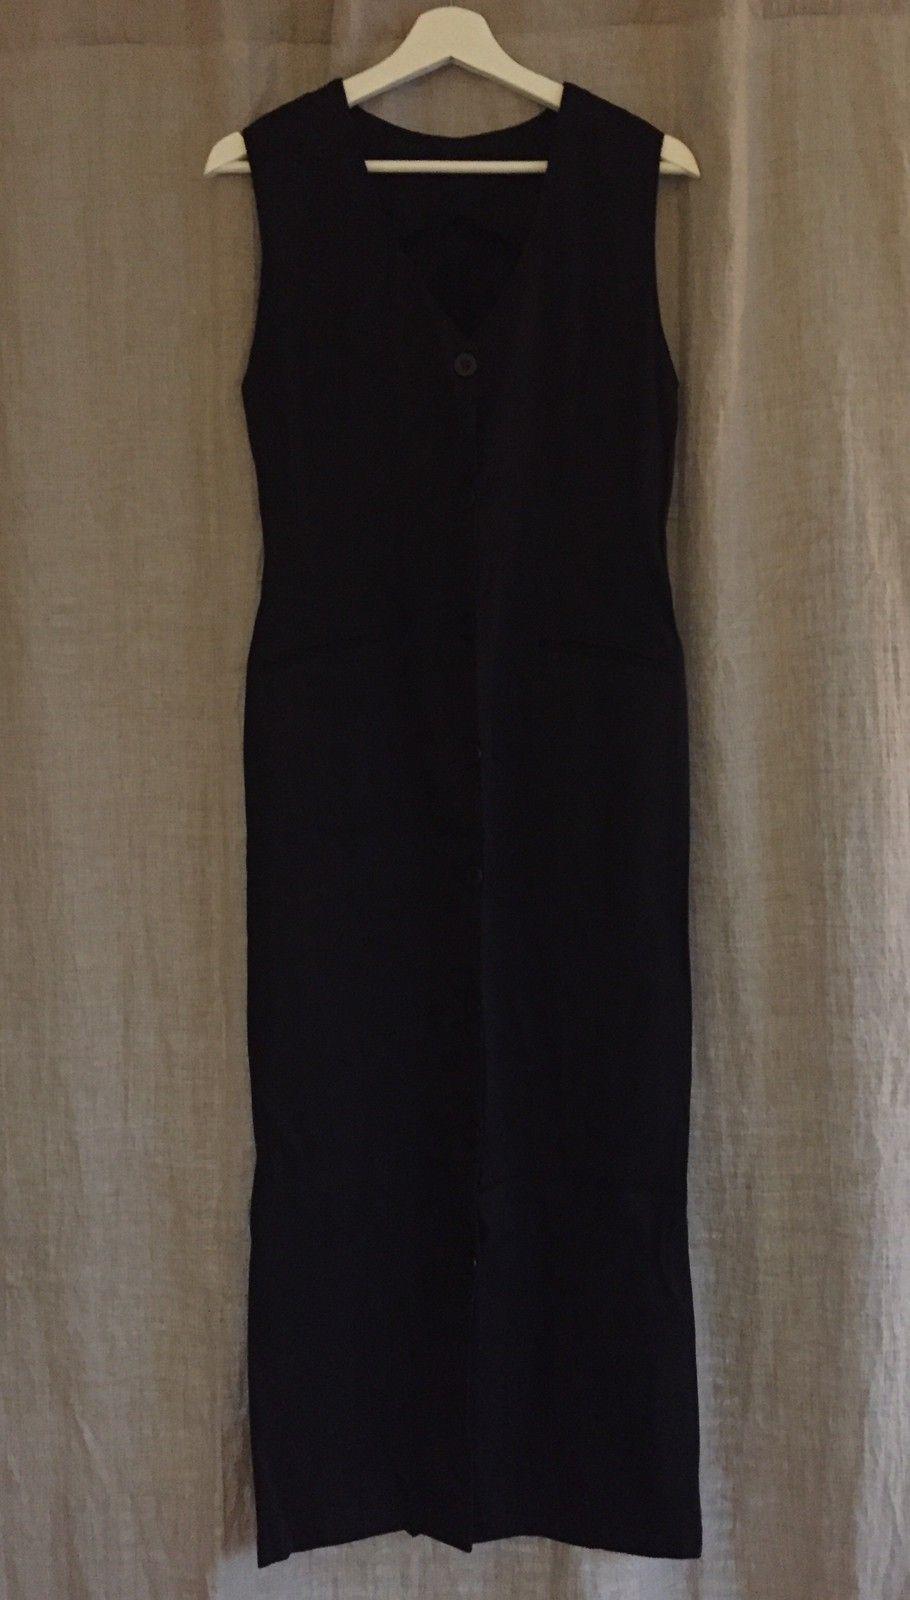 Sort lang kjole med knepping i str. M | FINN.no